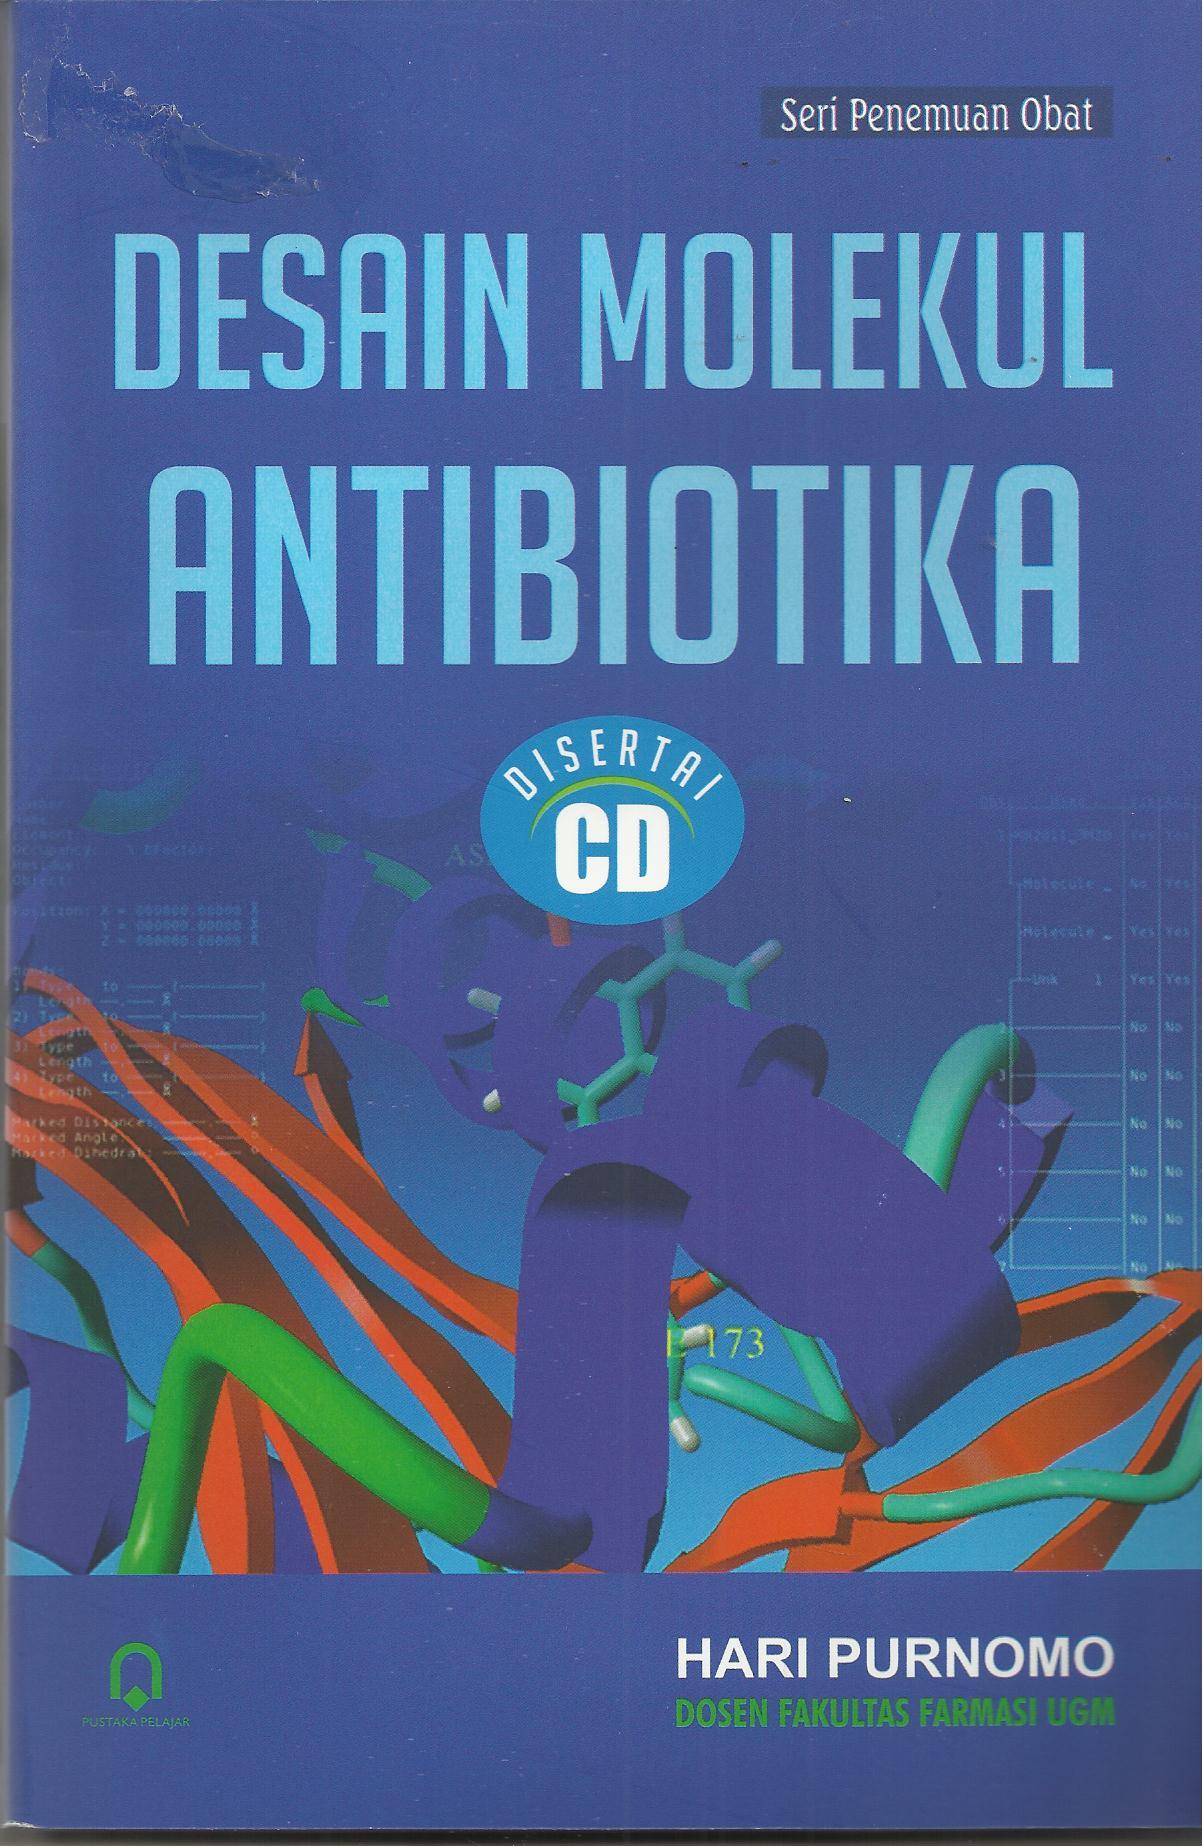 Desain Molekul Antibiotika